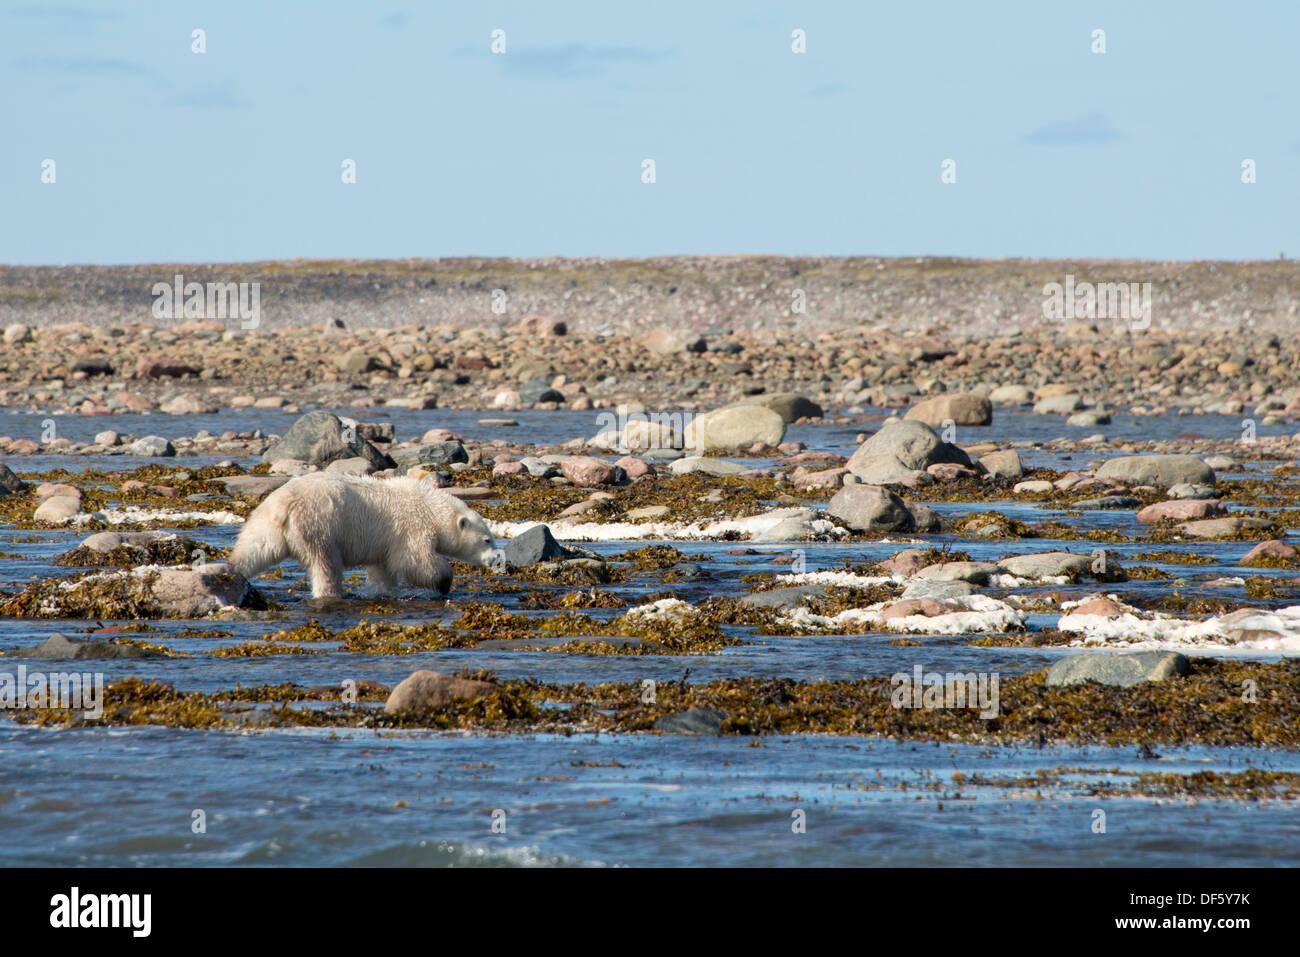 Canada, Nunavut, western shore of Hudson Bay, Kivalliq Region, Arviat. Young polar bear (Ursus maritimus). Stock Photo